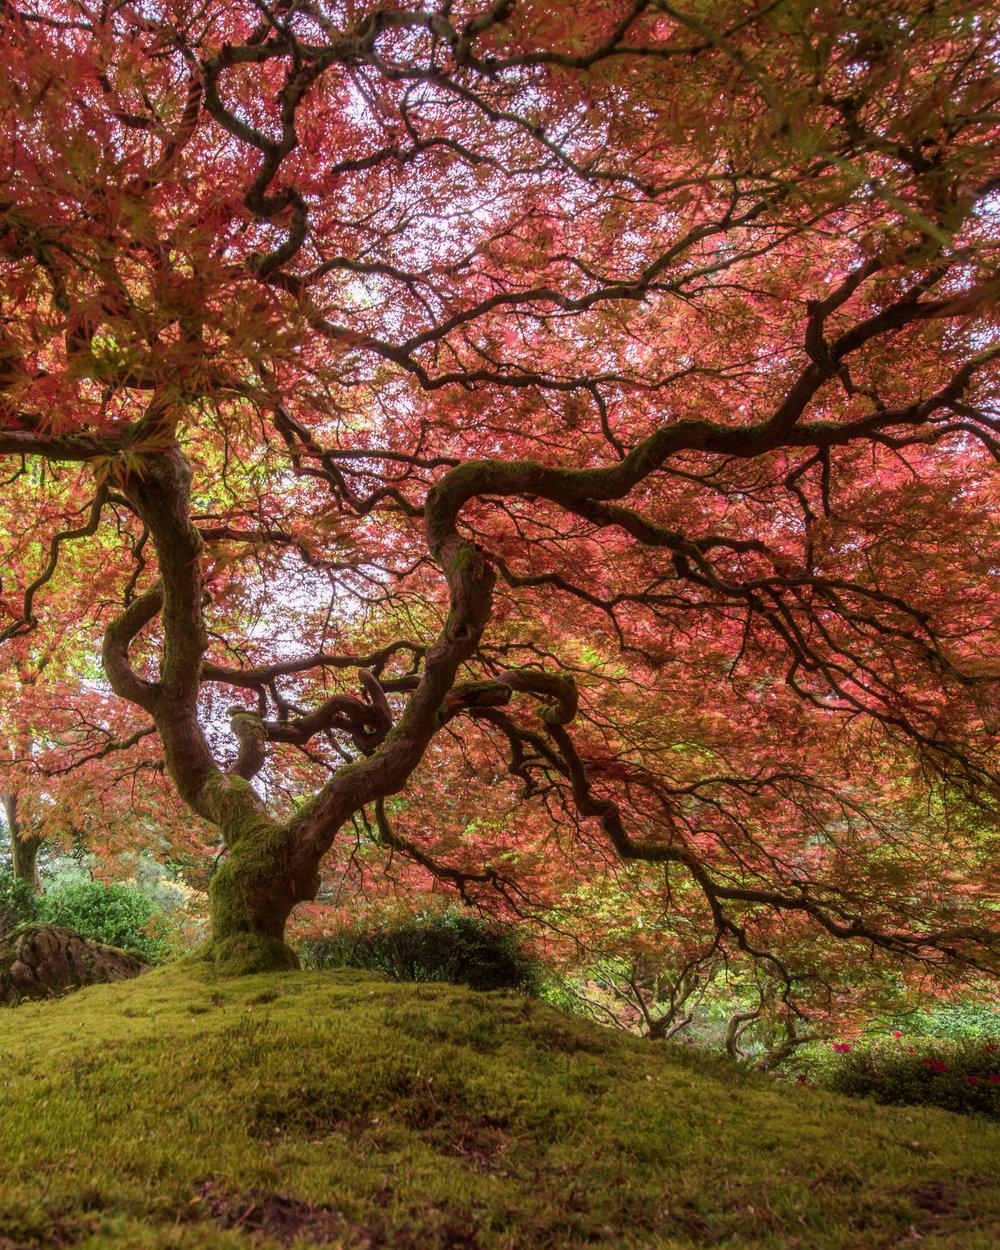 treeframe.jpg